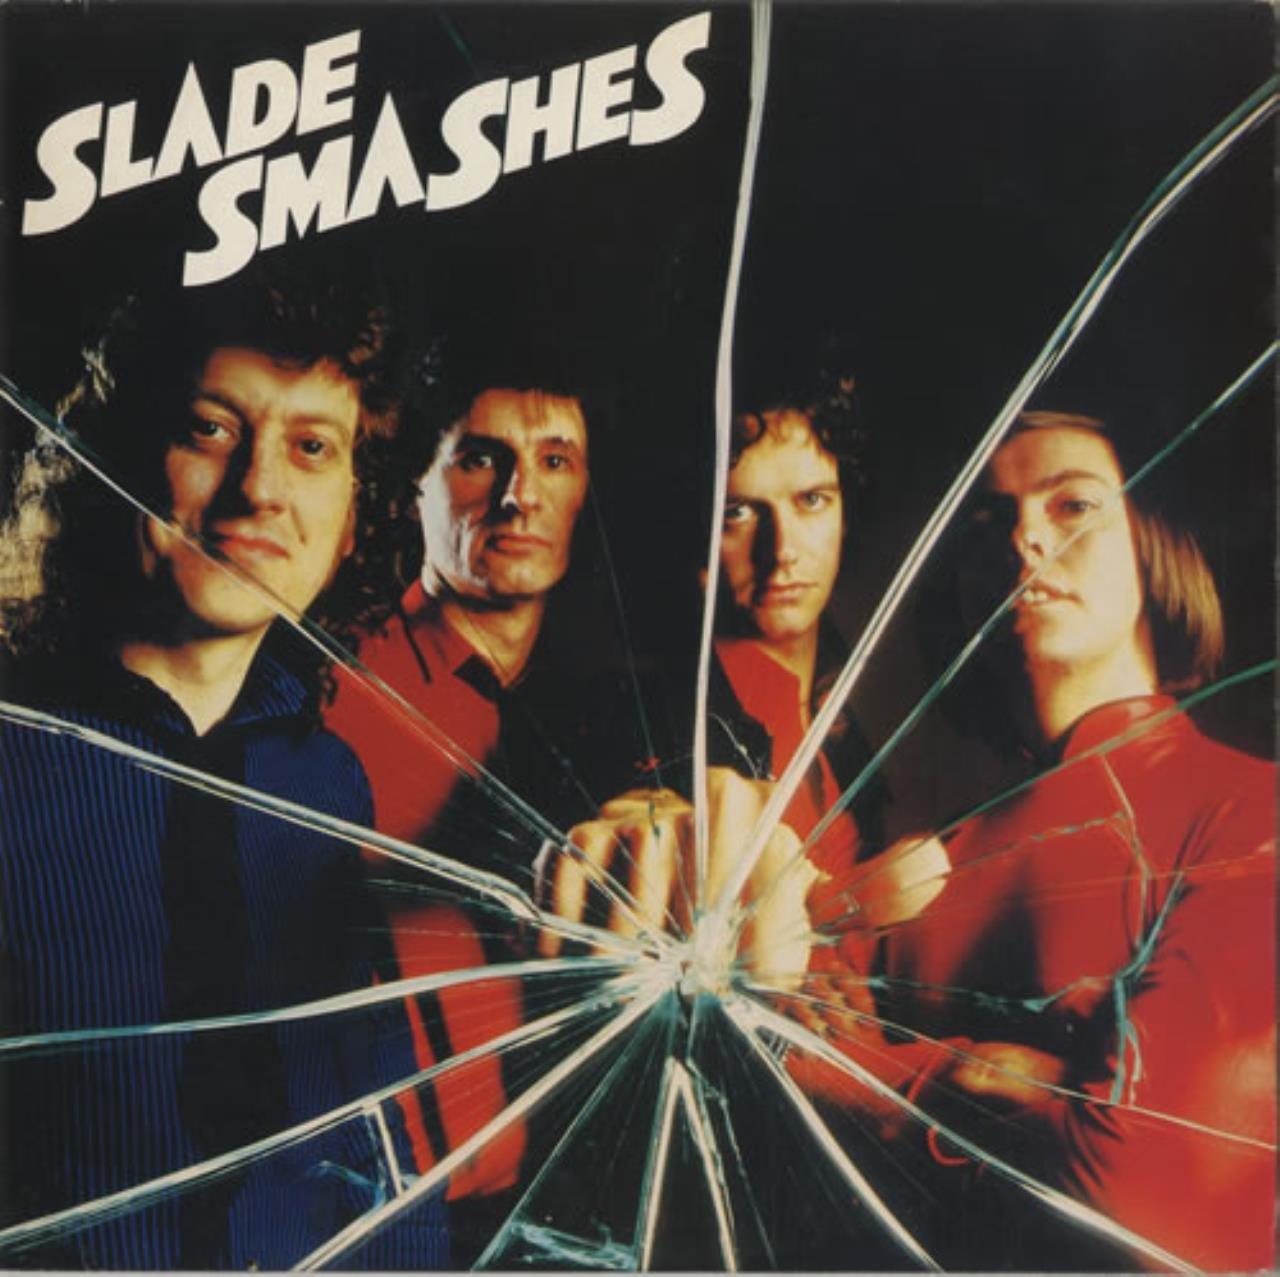 SLADE---''SMASHES''===LP